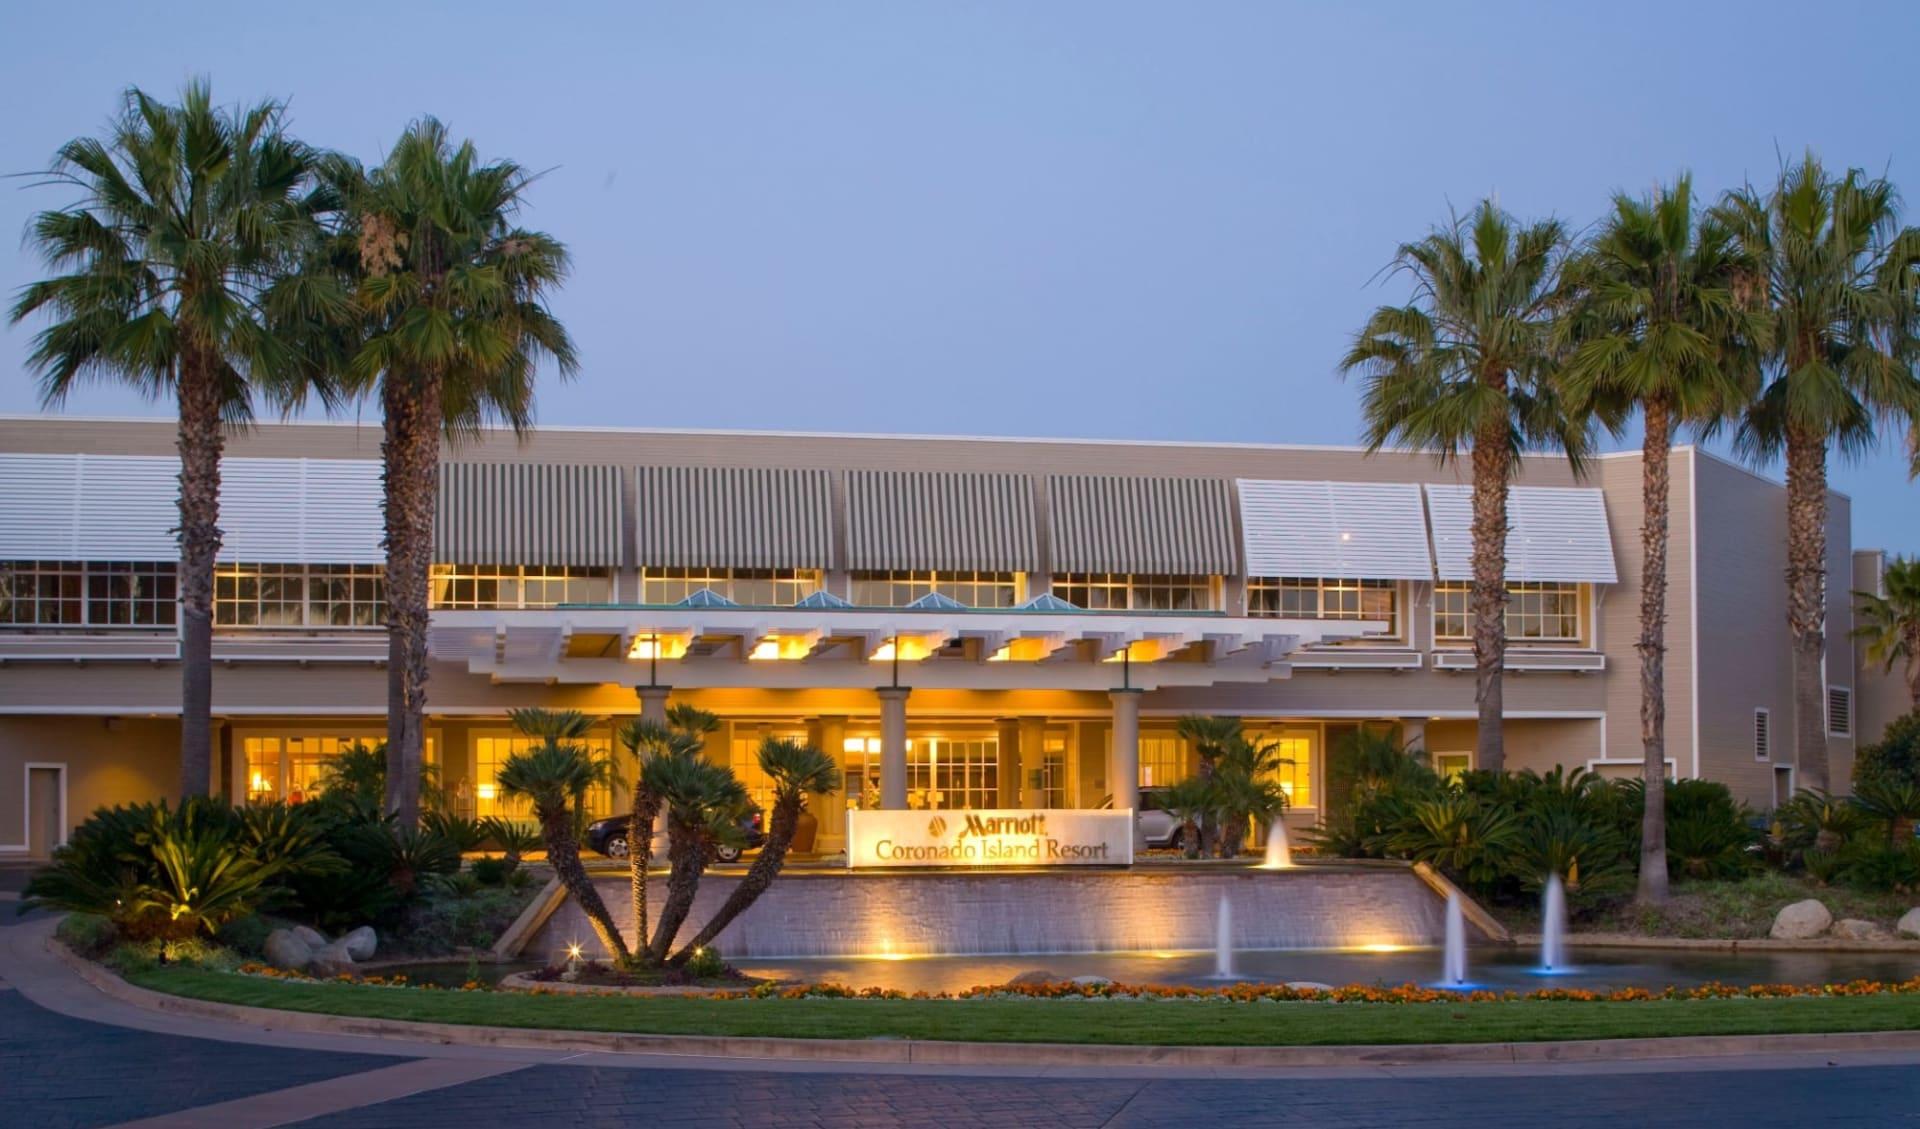 Coronado Island Marriott Resort in San Diego: Exterior_Coronado Island Marriott Resort_Aussenansicht2_Bonotel